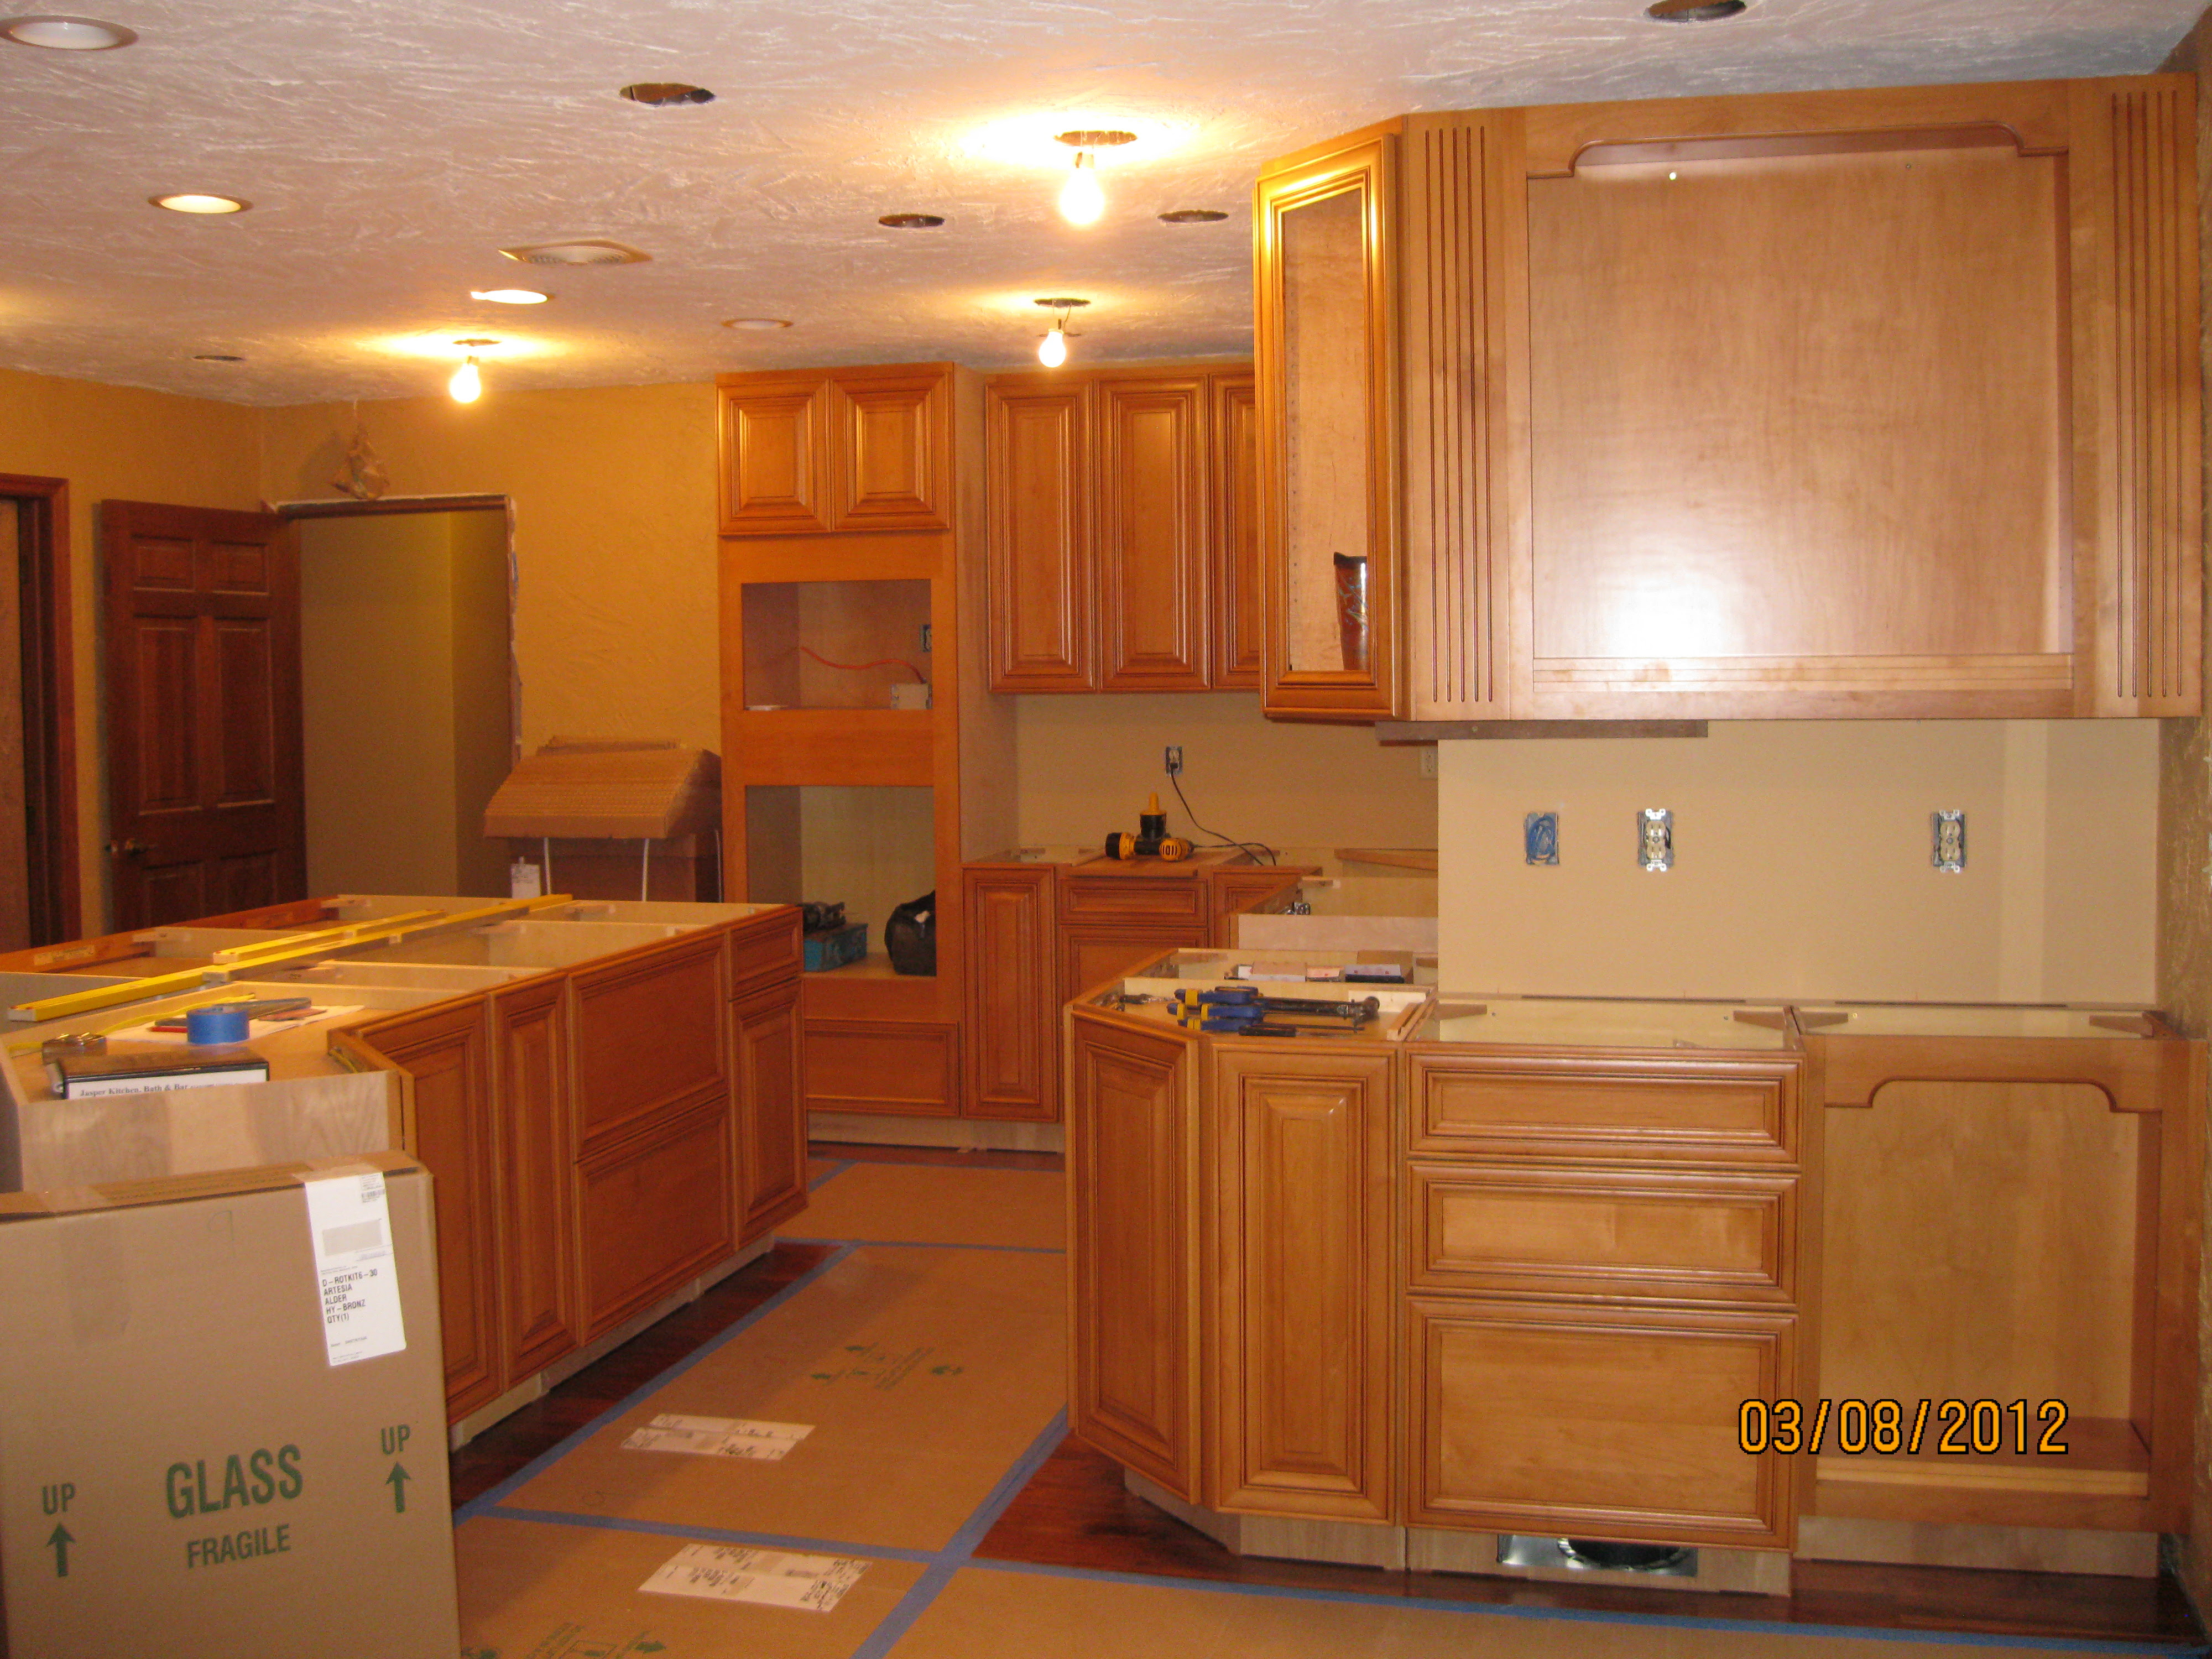 Springboro Kitchen - Cabinets - Remodeling Designs, Inc.